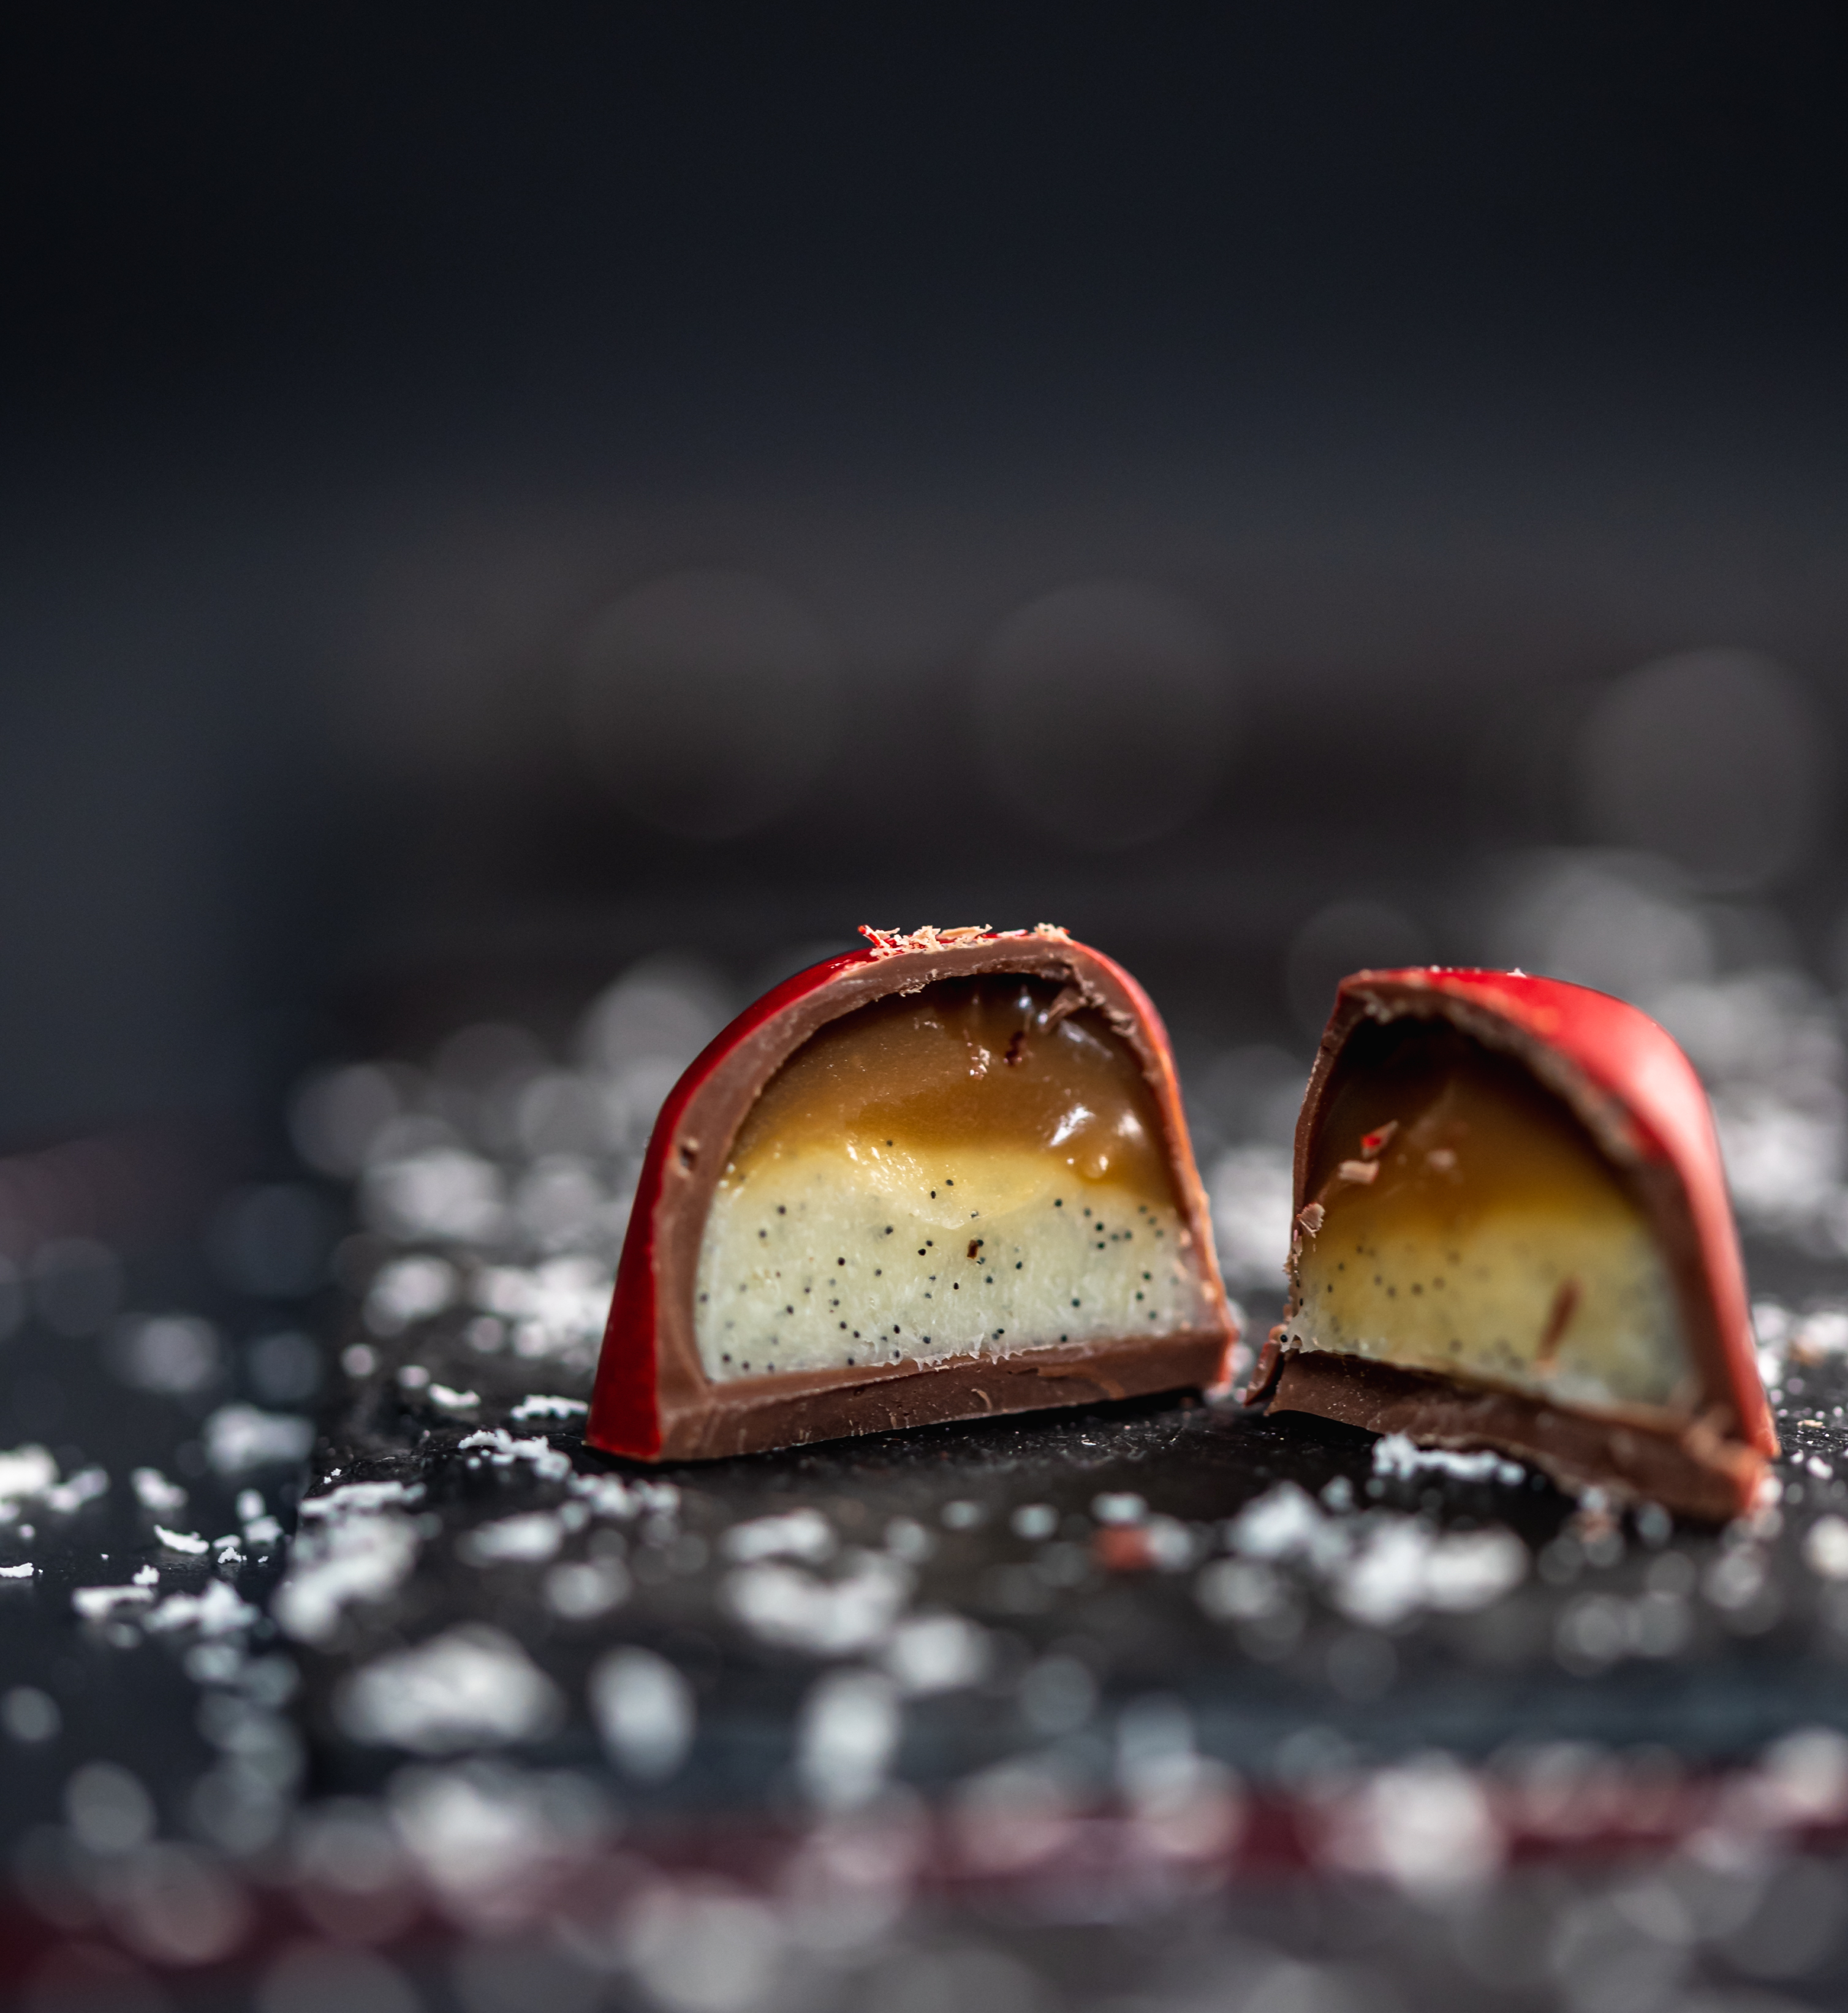 8 Milk Chocolate Raspberry caramels & 4 Milk Chocolate Passionfruit and vanilla hearts